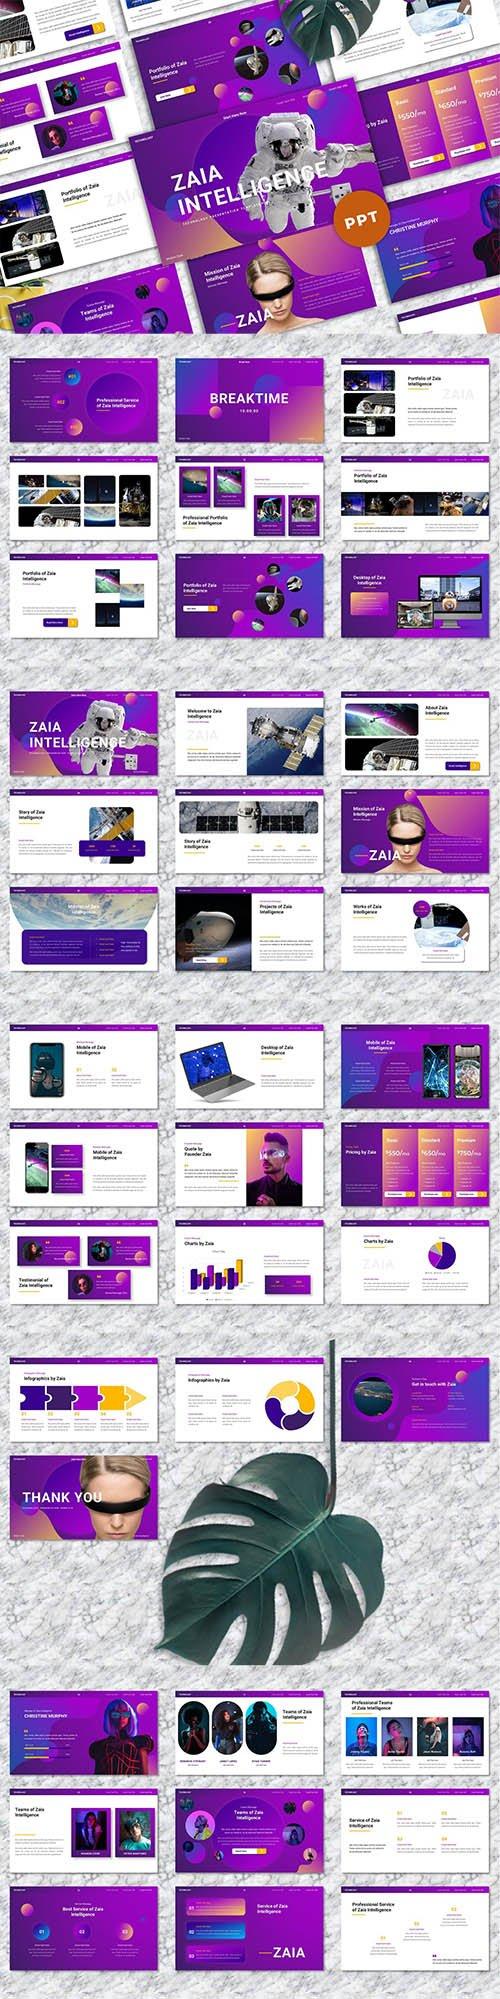 Zaia - Technology Powerpoint Template